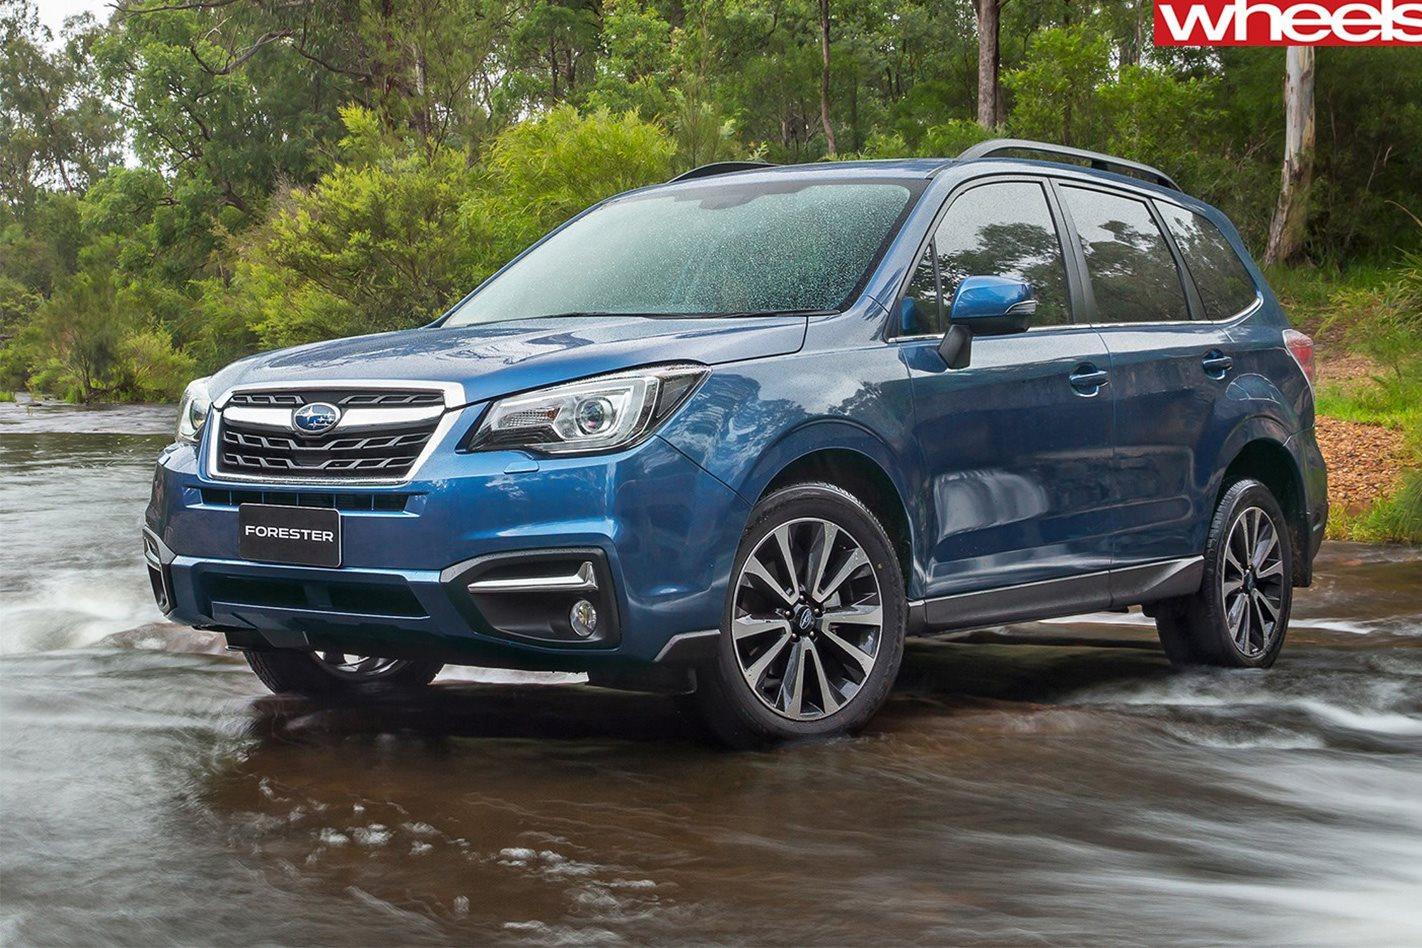 Subaru Forester Off Road >> 2016 Subaru Forester review | 4X4 Australia